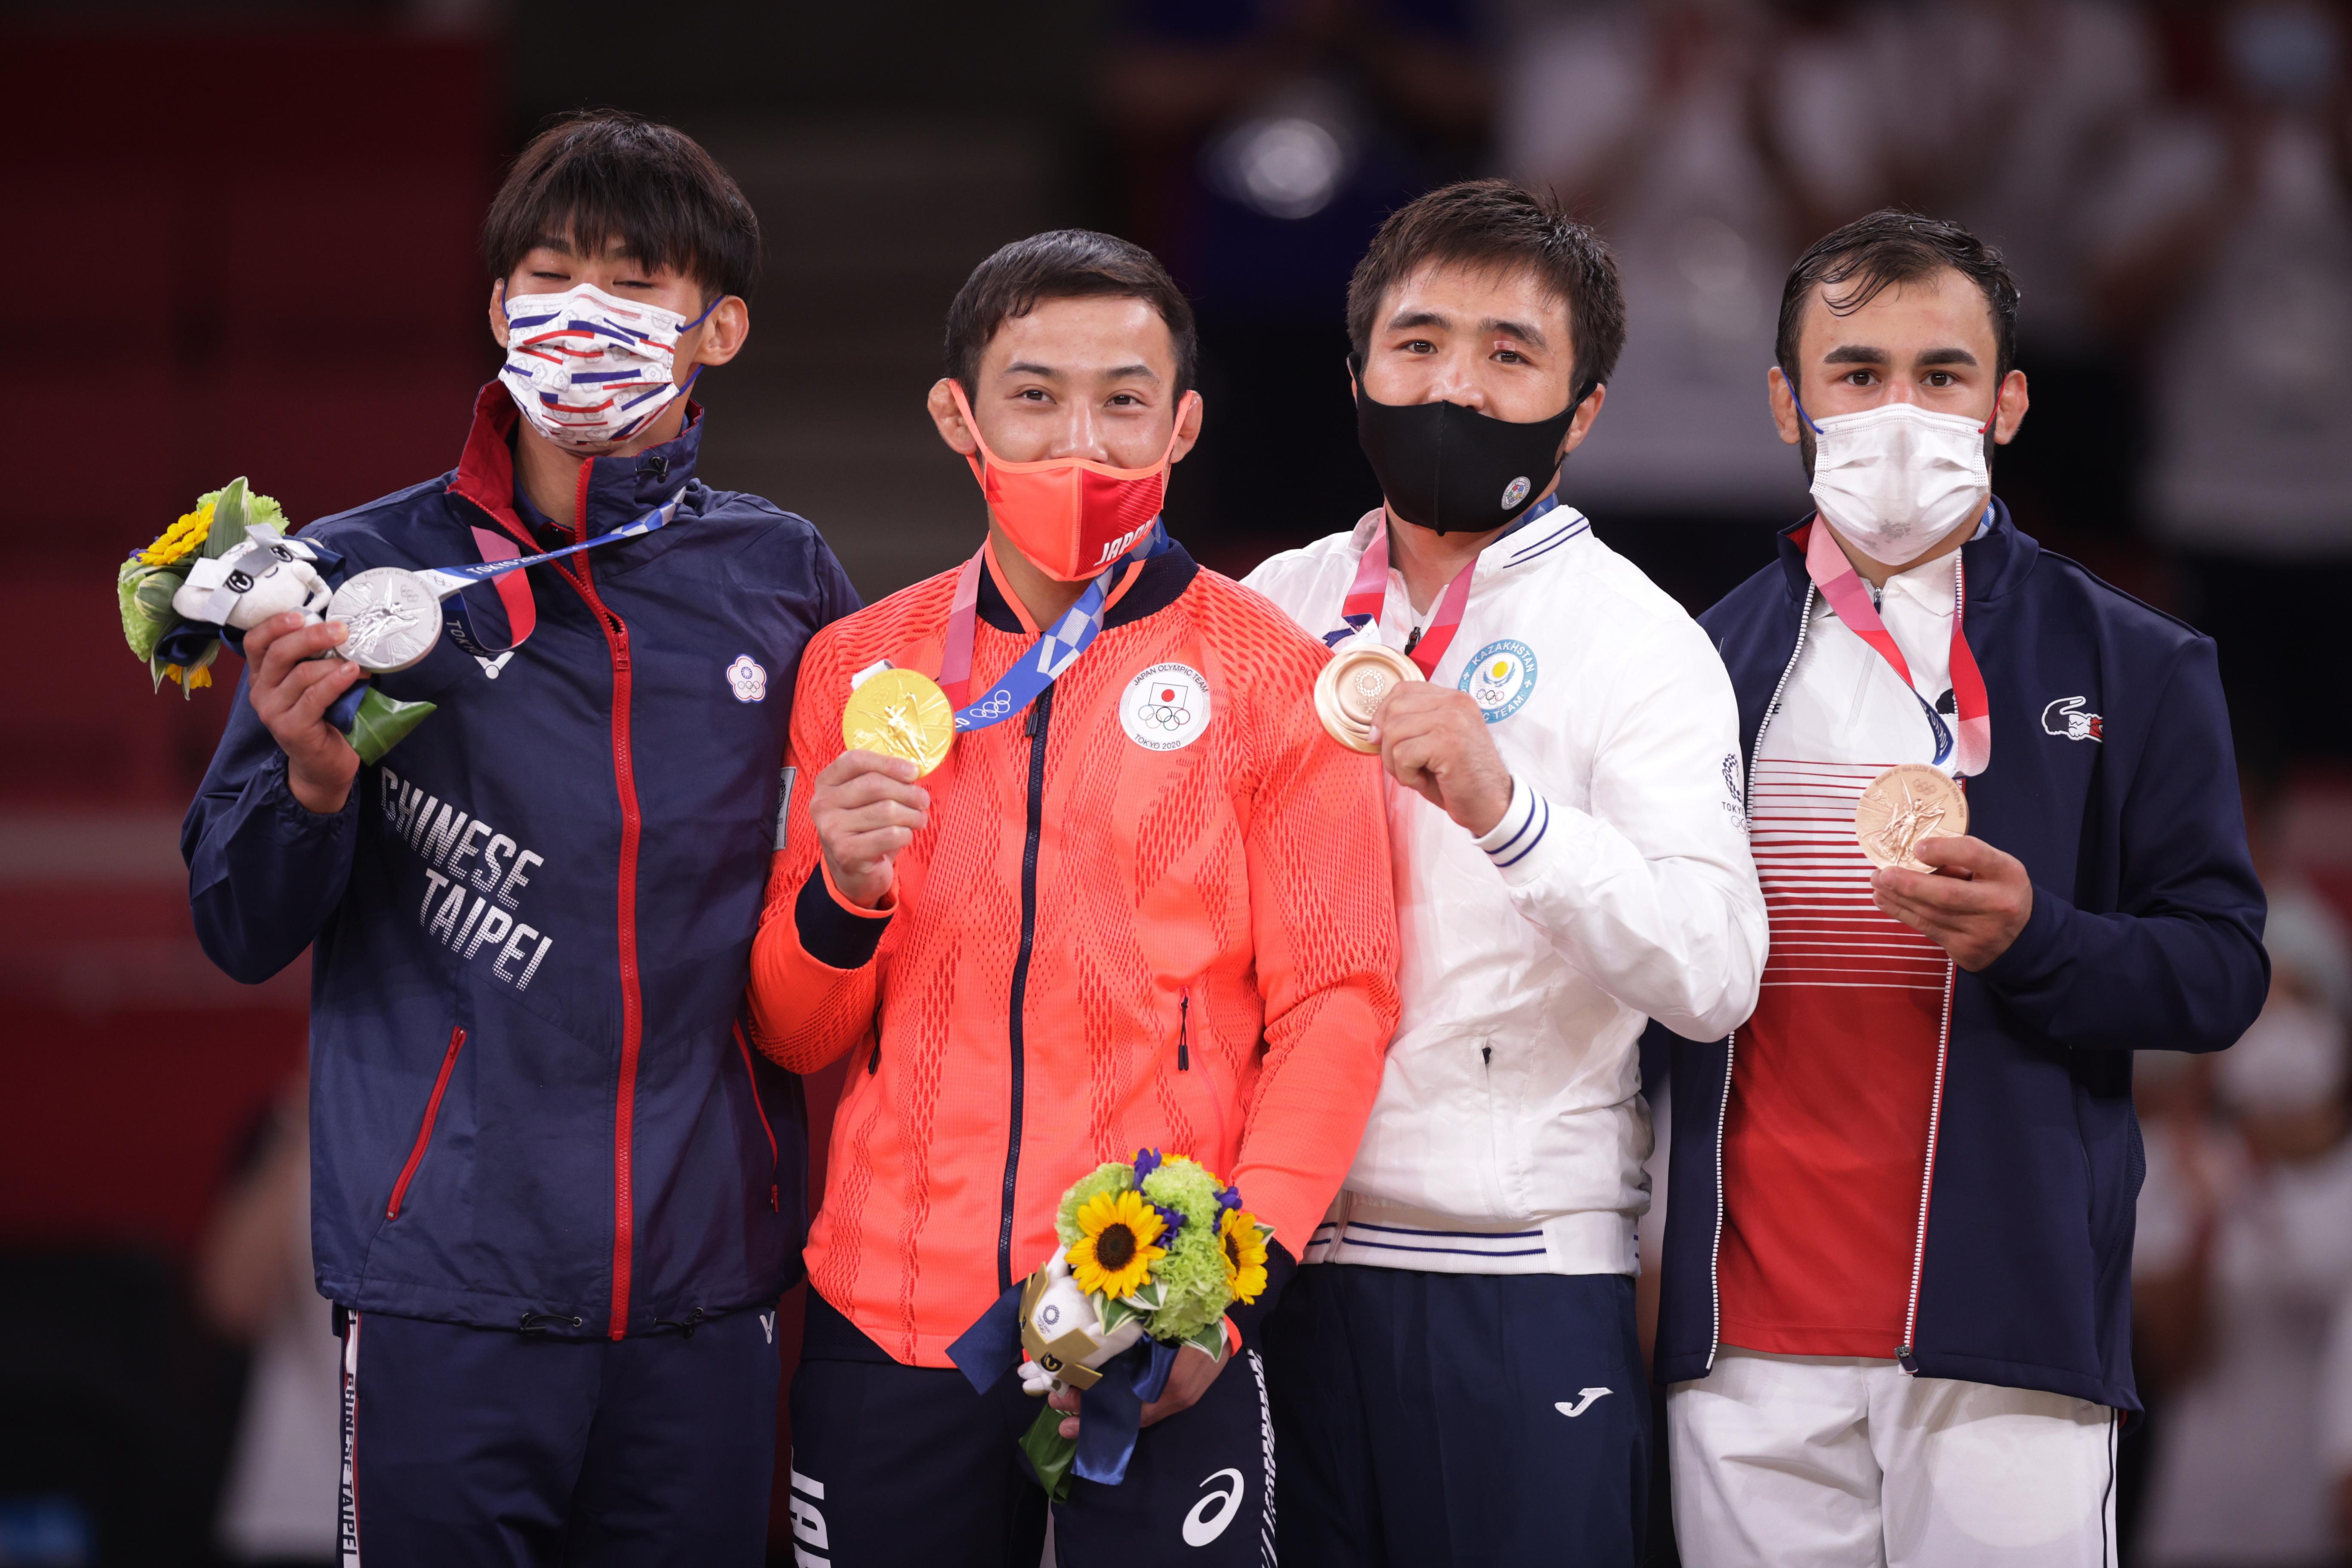 Tokyo 2020 Olympics - Judo - Men's 60kg - Medal Ceremony - Nippon Budokan - Tokyo, Japan - July 24, 2021. Gold medallist Naohisa Takato of Japan celebrates with silver medallist Yang Yung Wei of Taiwan, bronze medallist Yeldos Smetov of Kazakhstan, and bronze medallist Luka Mkheidze of France REUTERS/Hannah Mckay